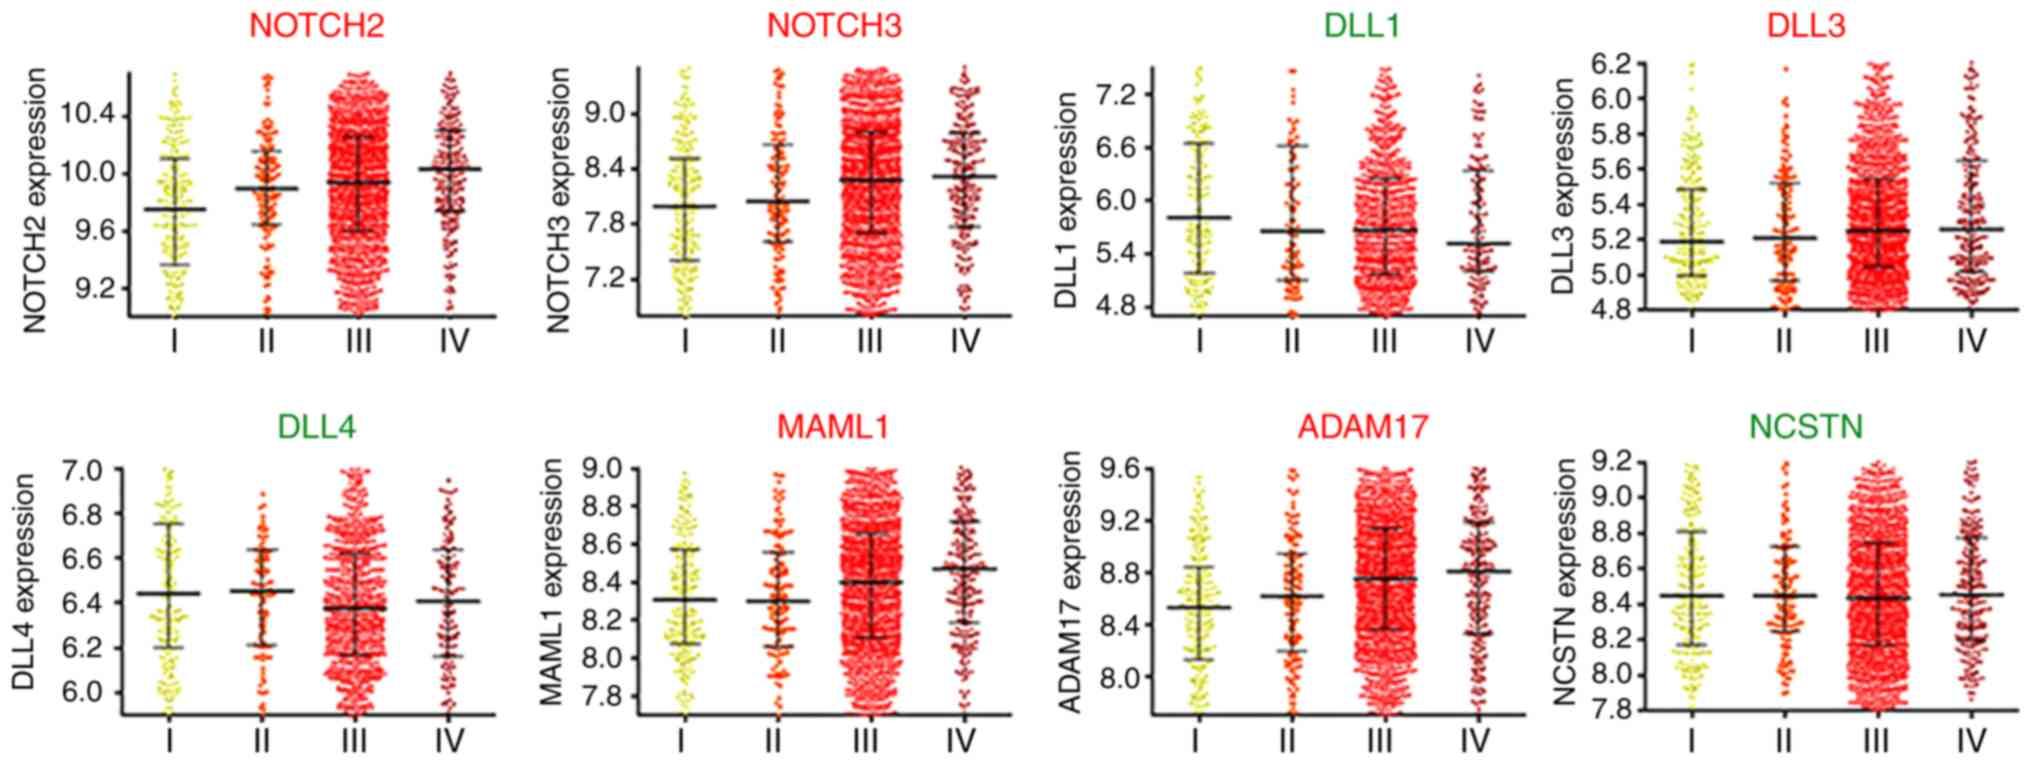 Notch2 Notch3 Dll3 Maml1 Adam17 Signaling Network Is Associated With Ovarian Cancer